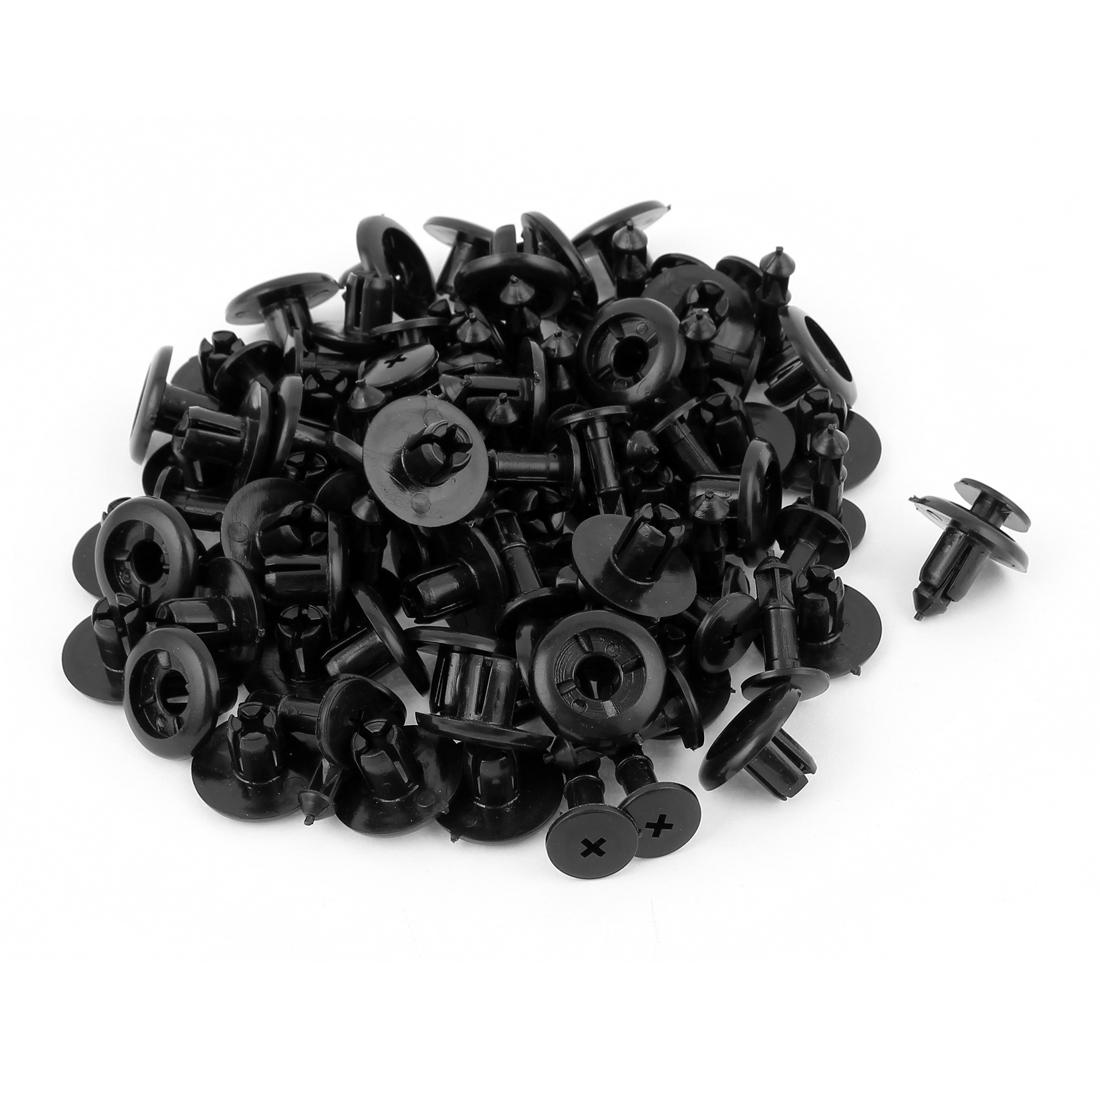 50 Pcs 7.8mm Hole Plastic Push Type Rivet Retainer Fastener Bumper Pin Clips